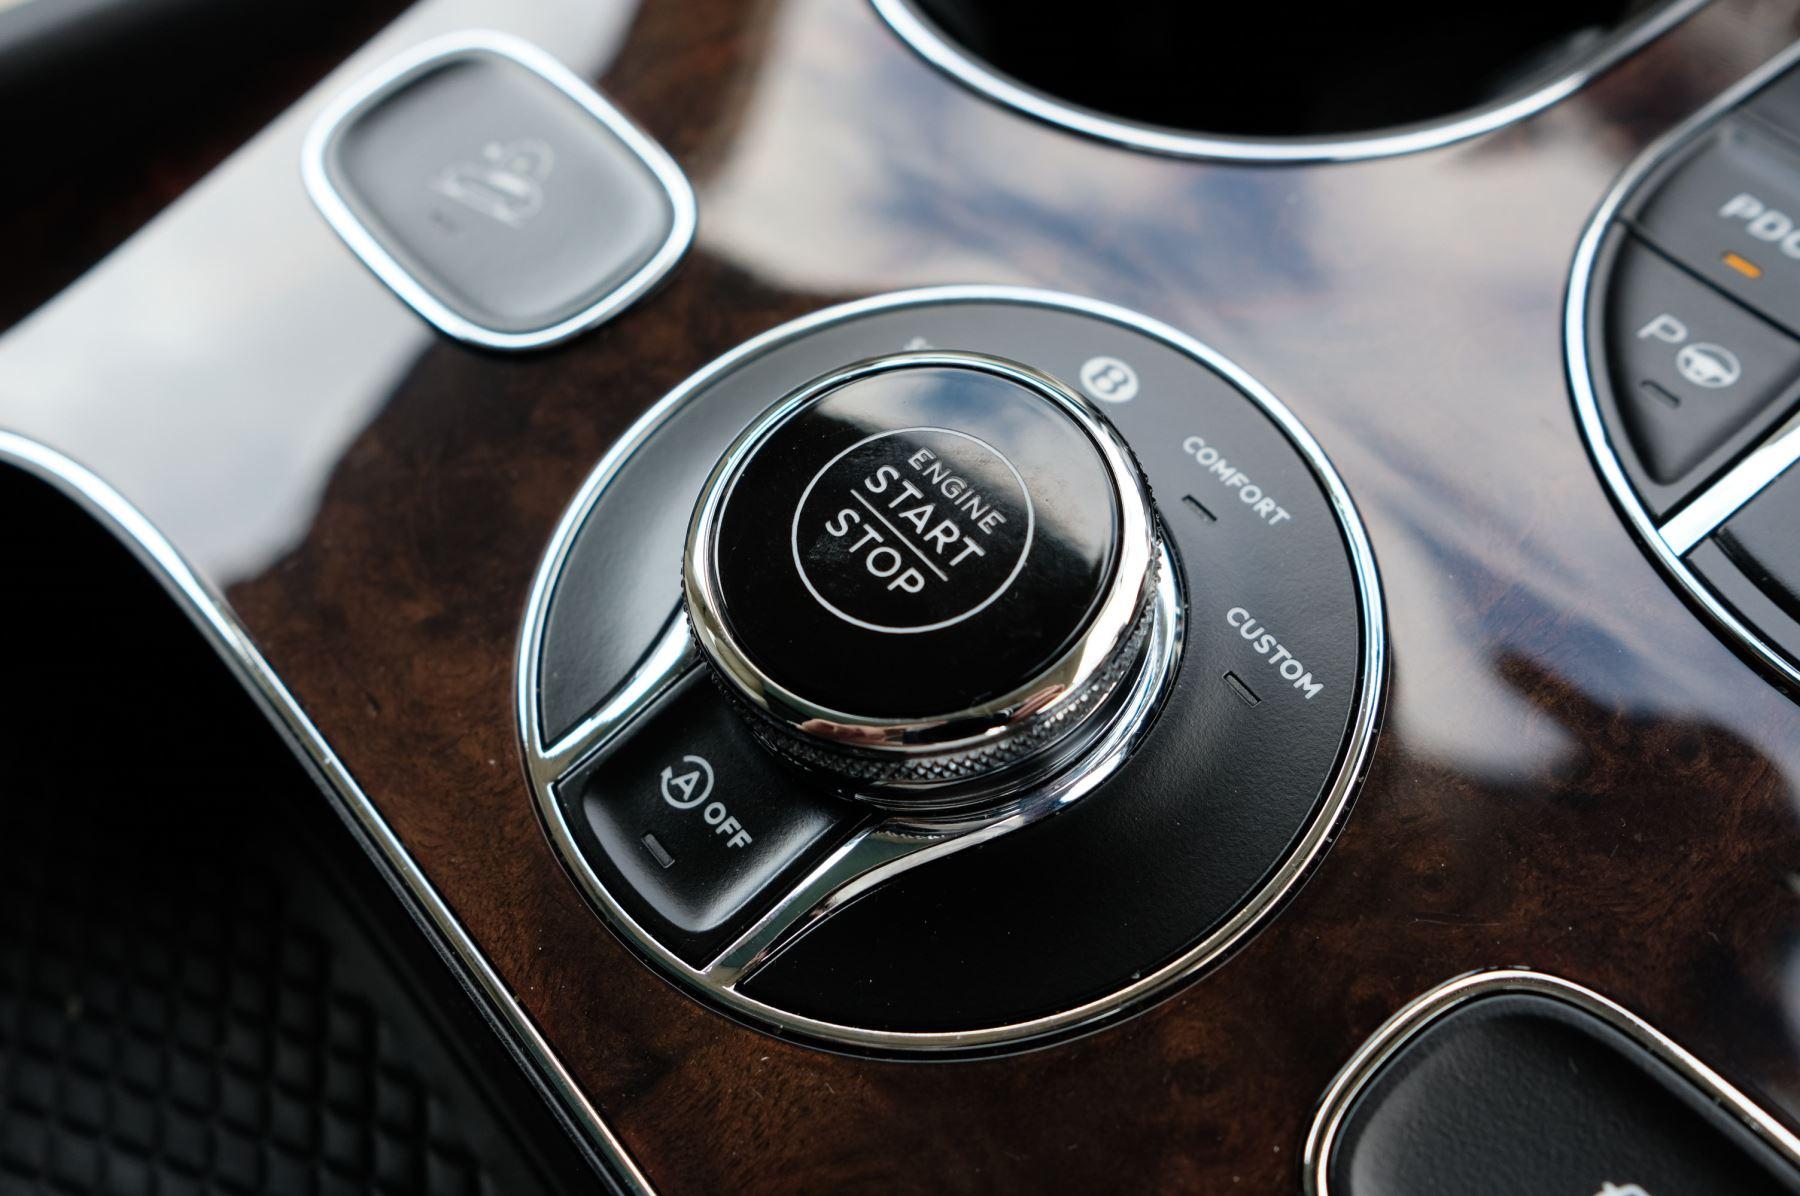 Bentley Bentayga 4.0 V8 5dr - Mulliner Driving Specification - City & Tour Specification image 24